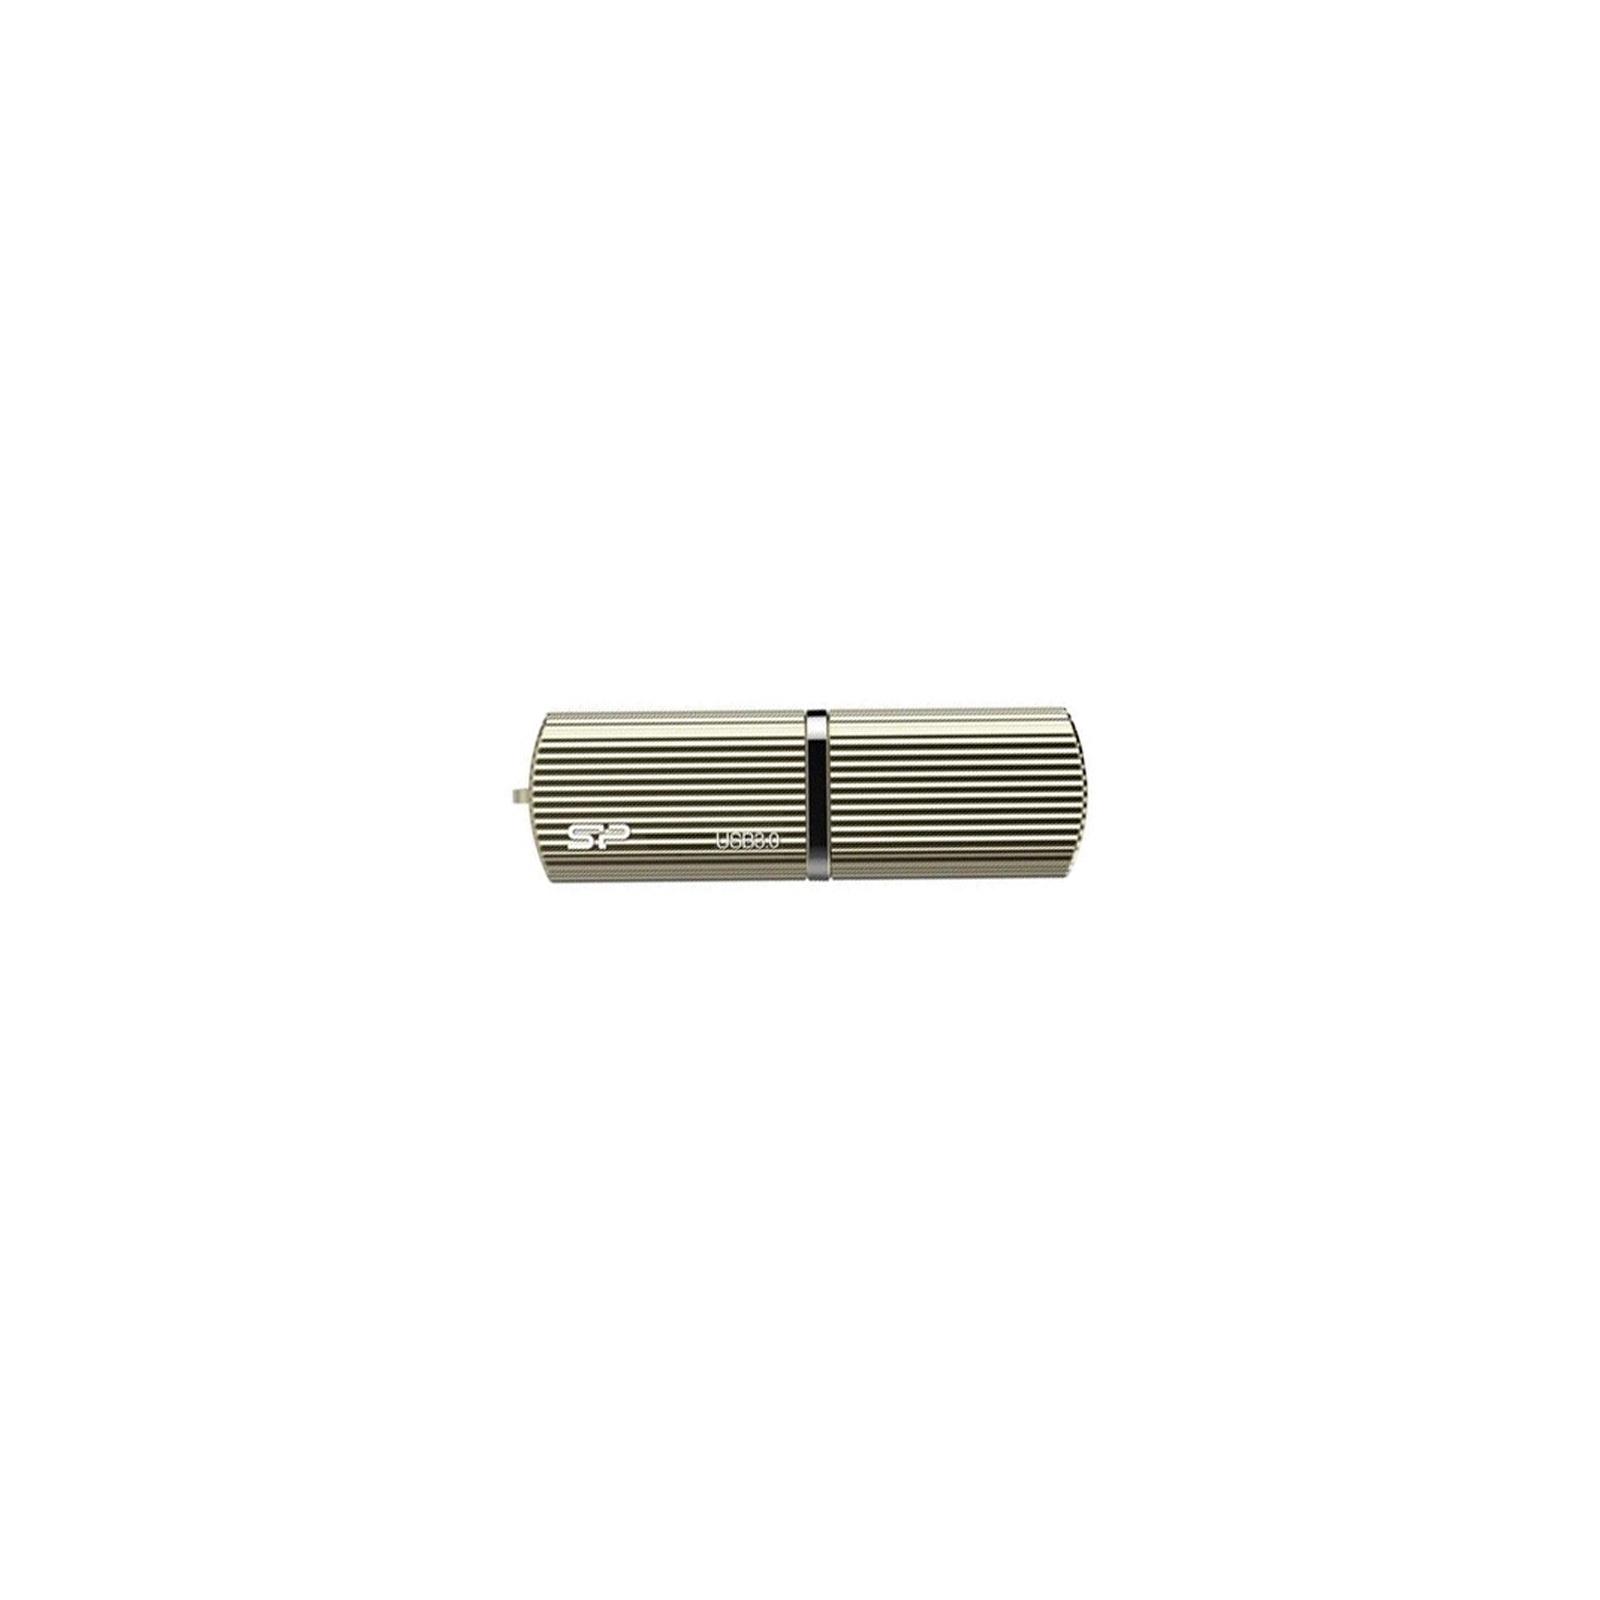 USB флеш накопитель Silicon Power 64GB MARVEL M50 Champagne USB 3.0 (SP064GBUF3M50V1С)